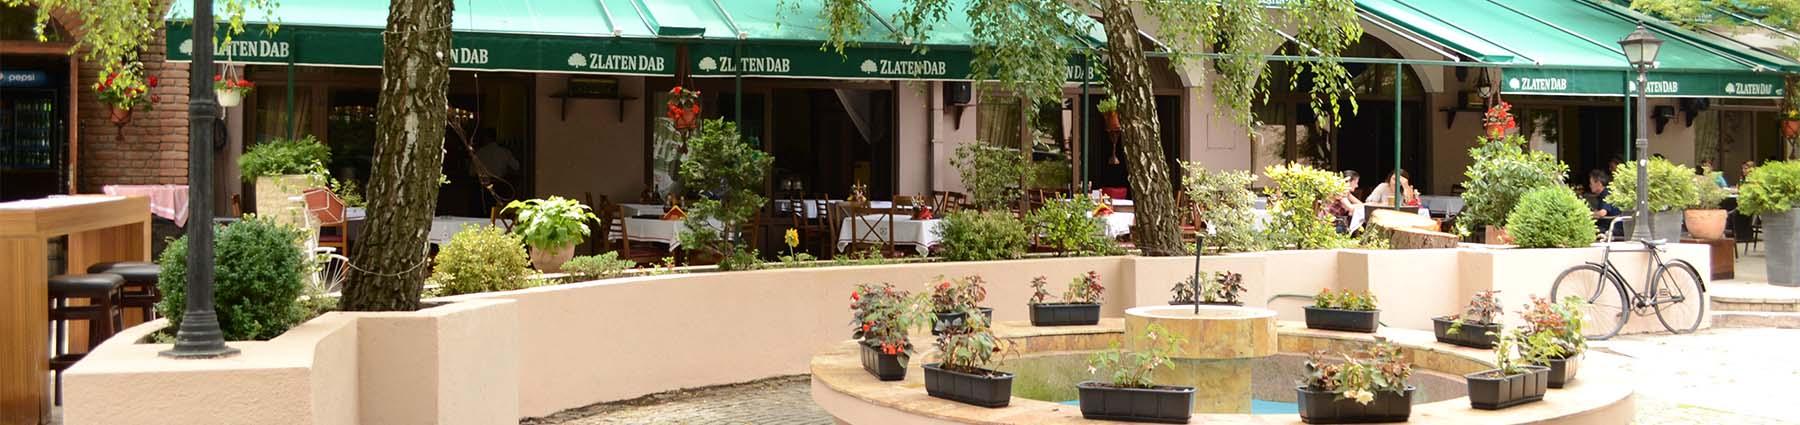 Restaurant Baba Cana